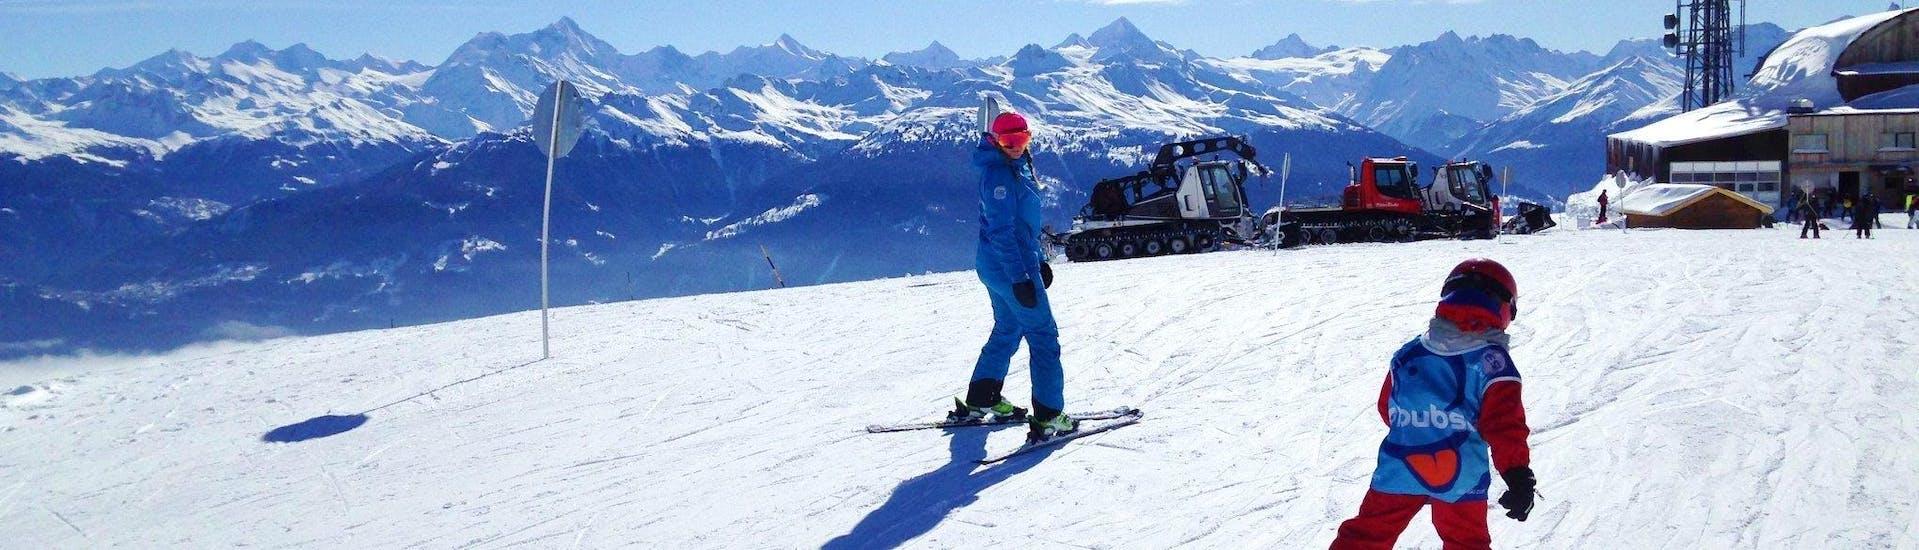 private-ski-lessons-for-kids-low-season-esi-glycerine-anzere-hero